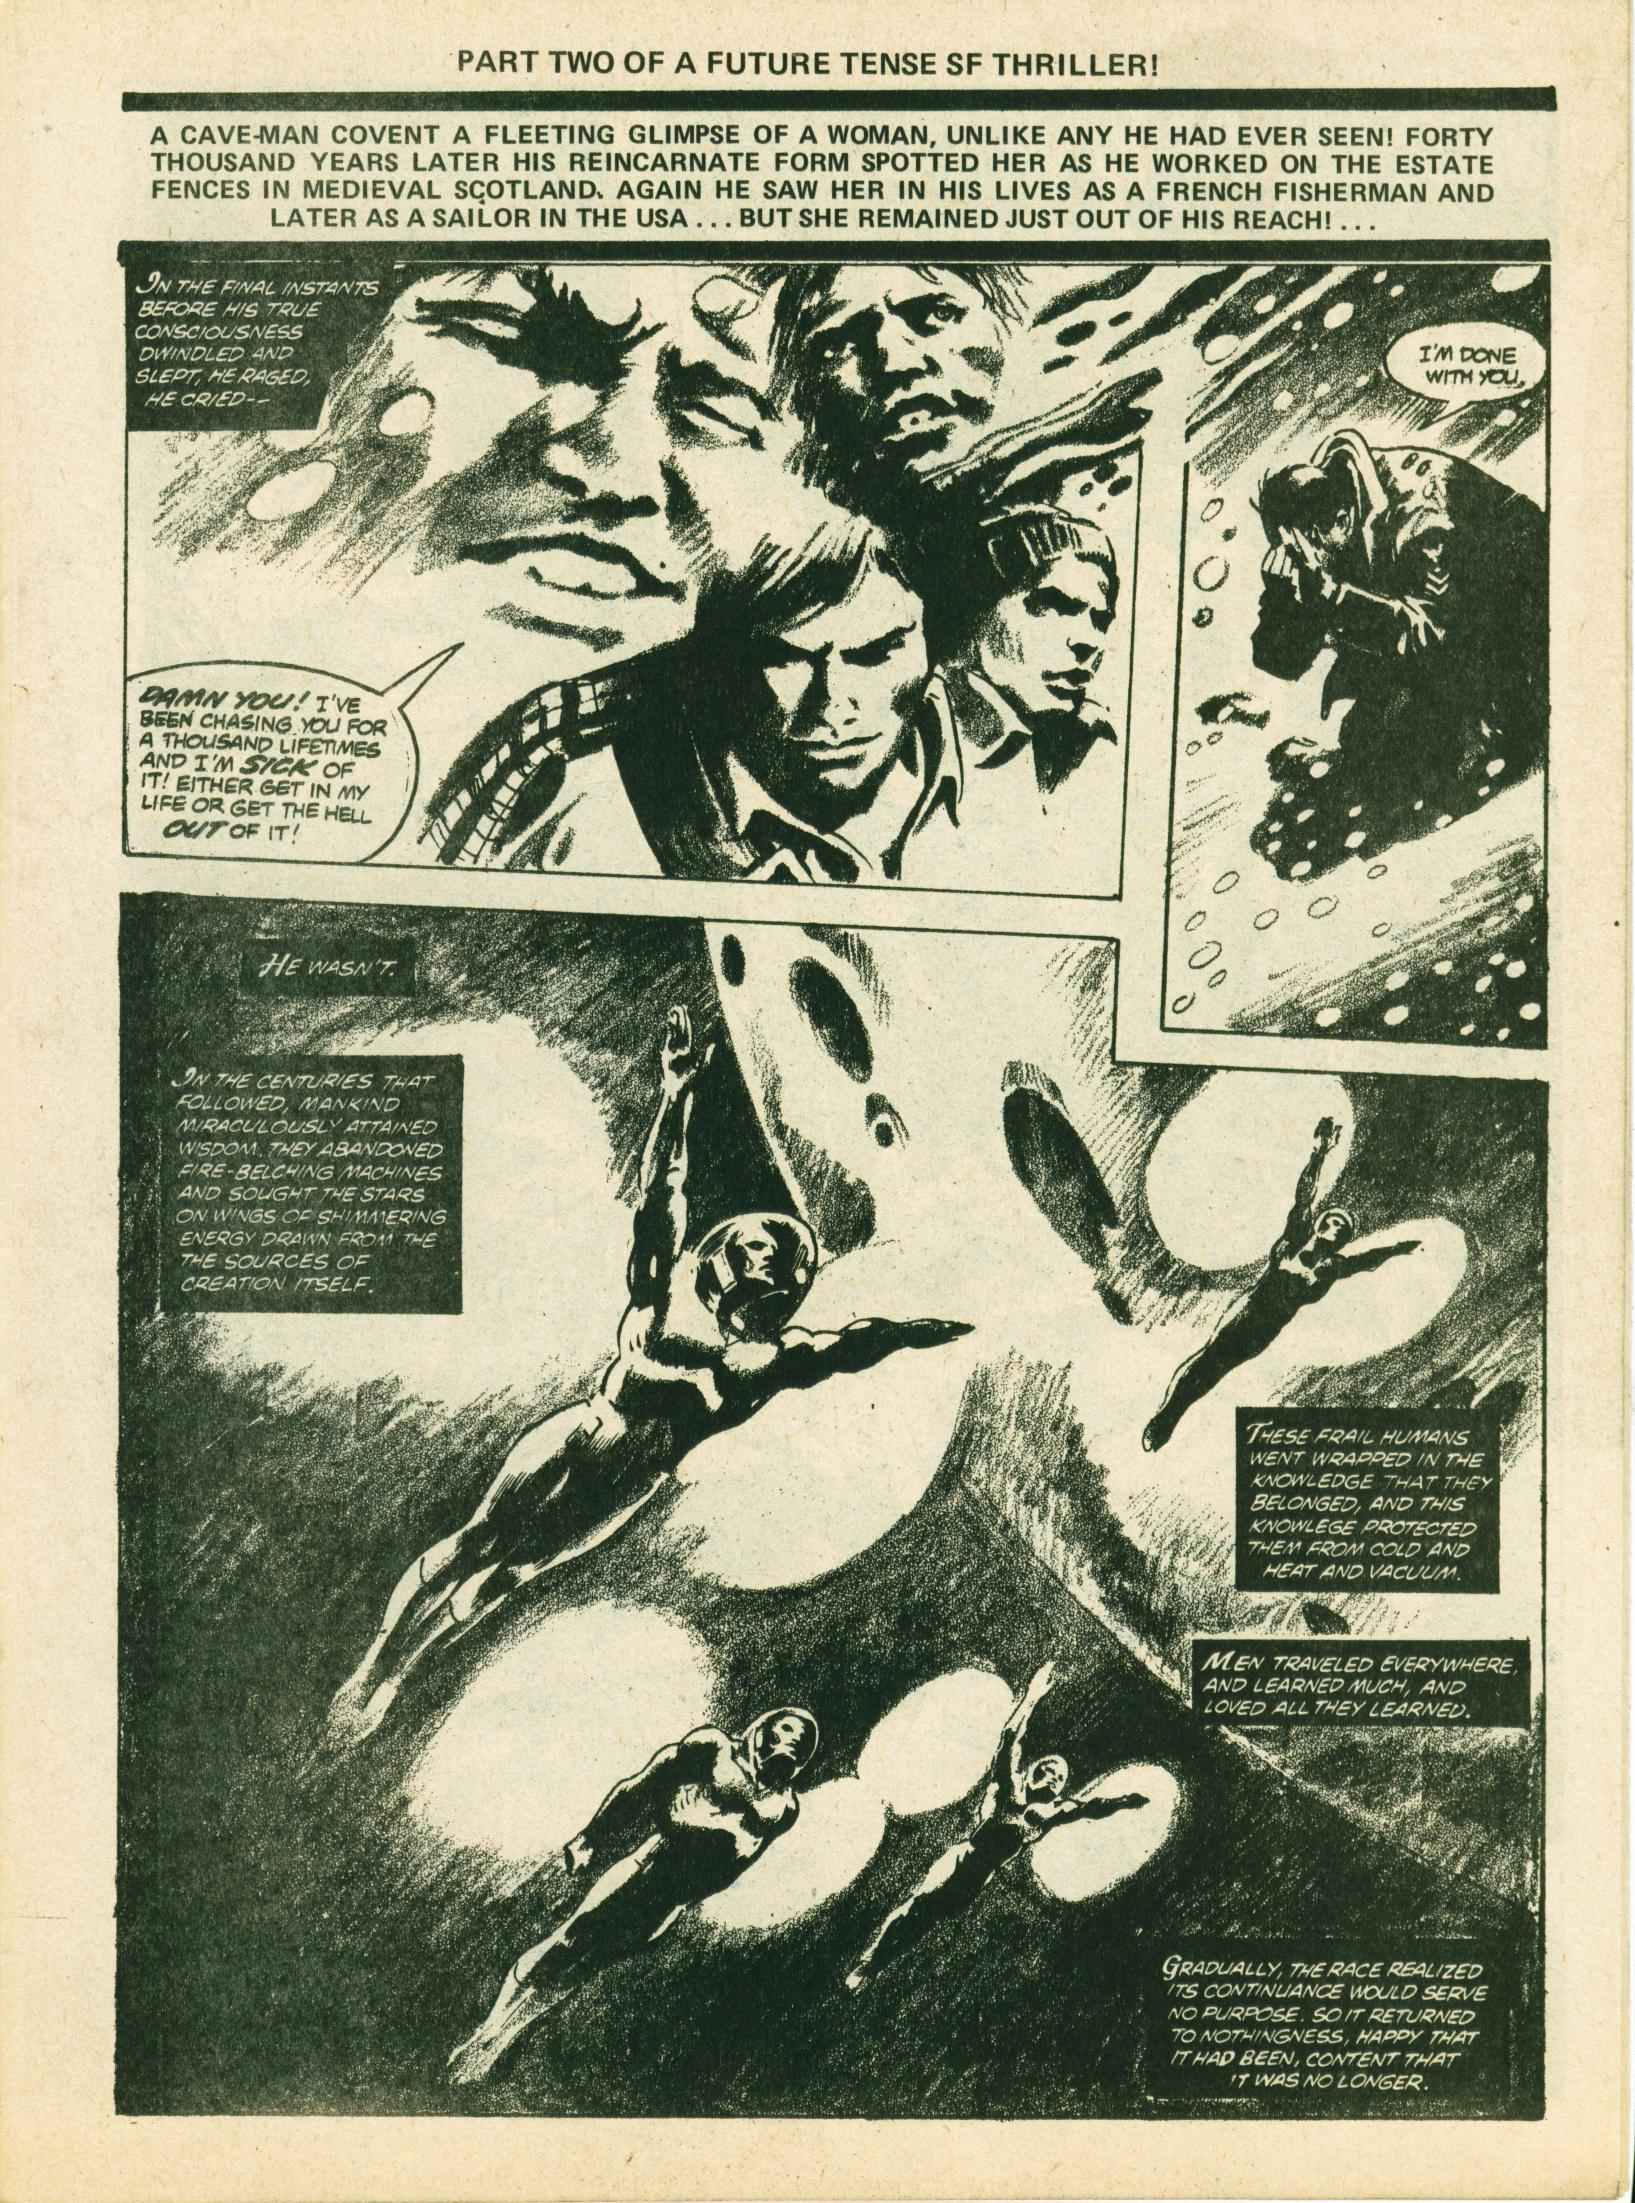 Read online Future Tense comic -  Issue #13 - 21